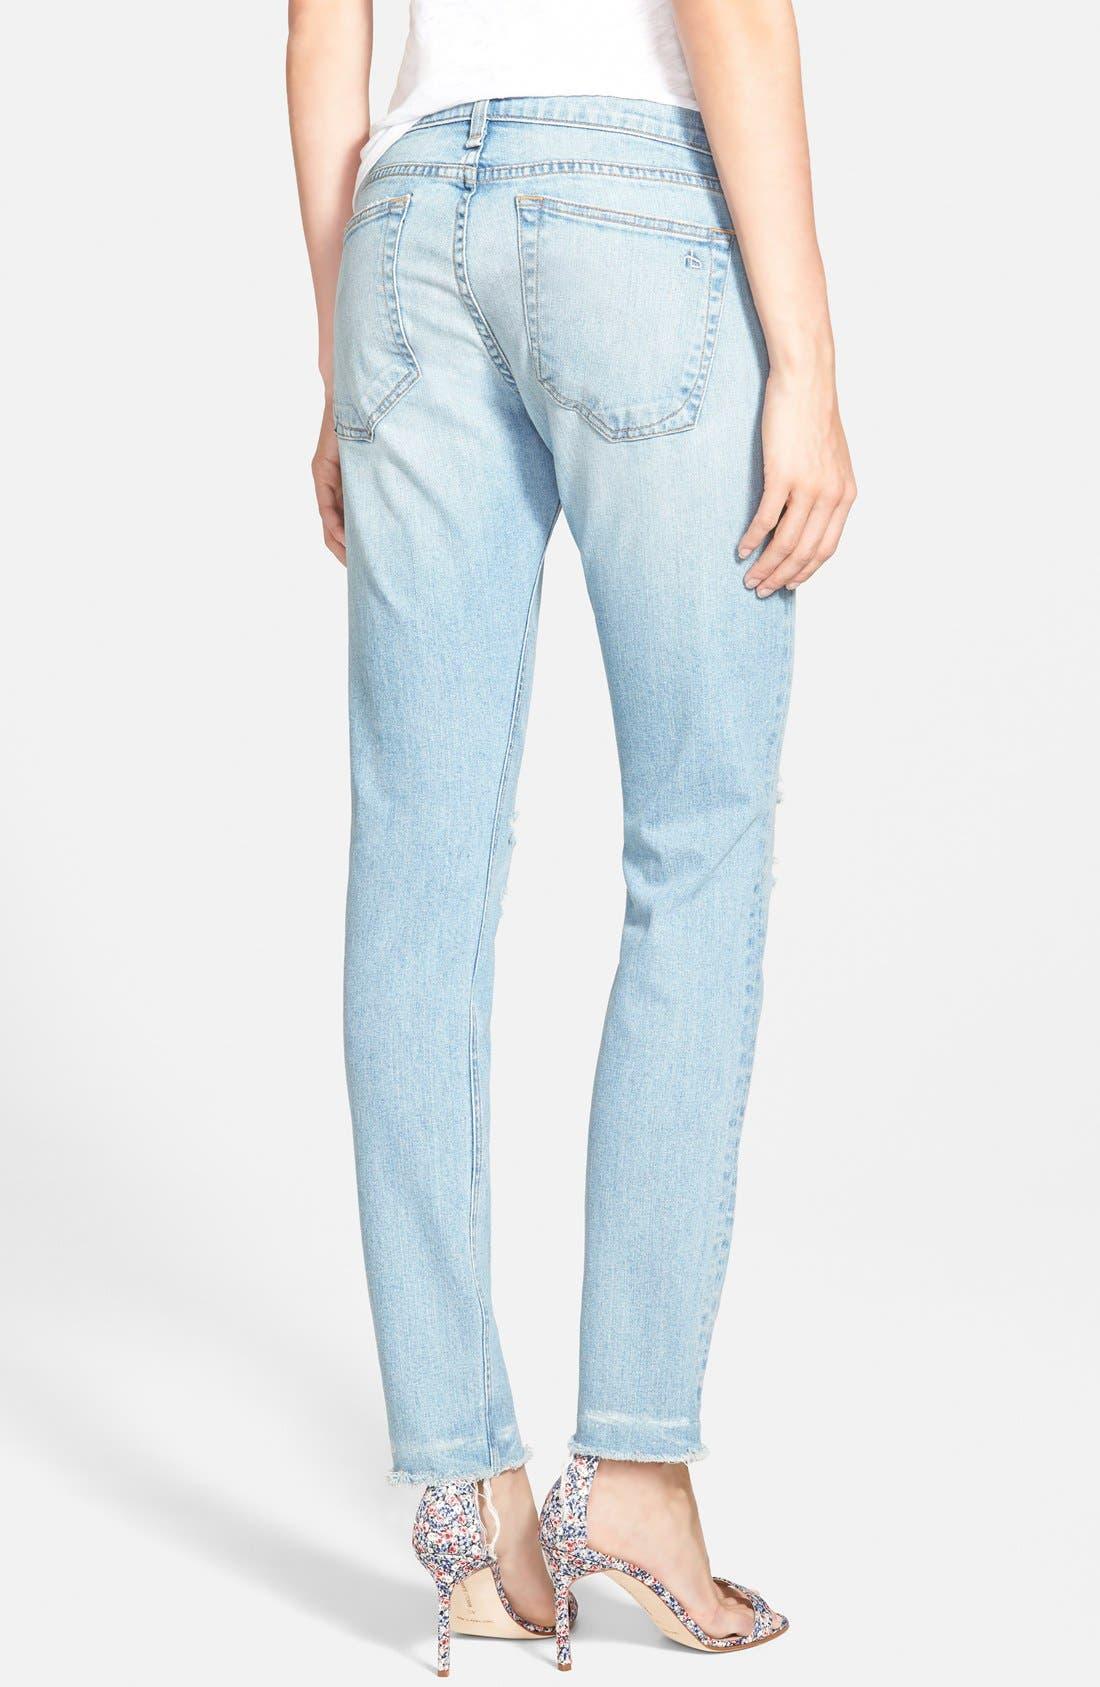 Alternate Image 2  - rag & bone/JEAN 'Dre' Distressed Ankle Jeans (Abingdon)